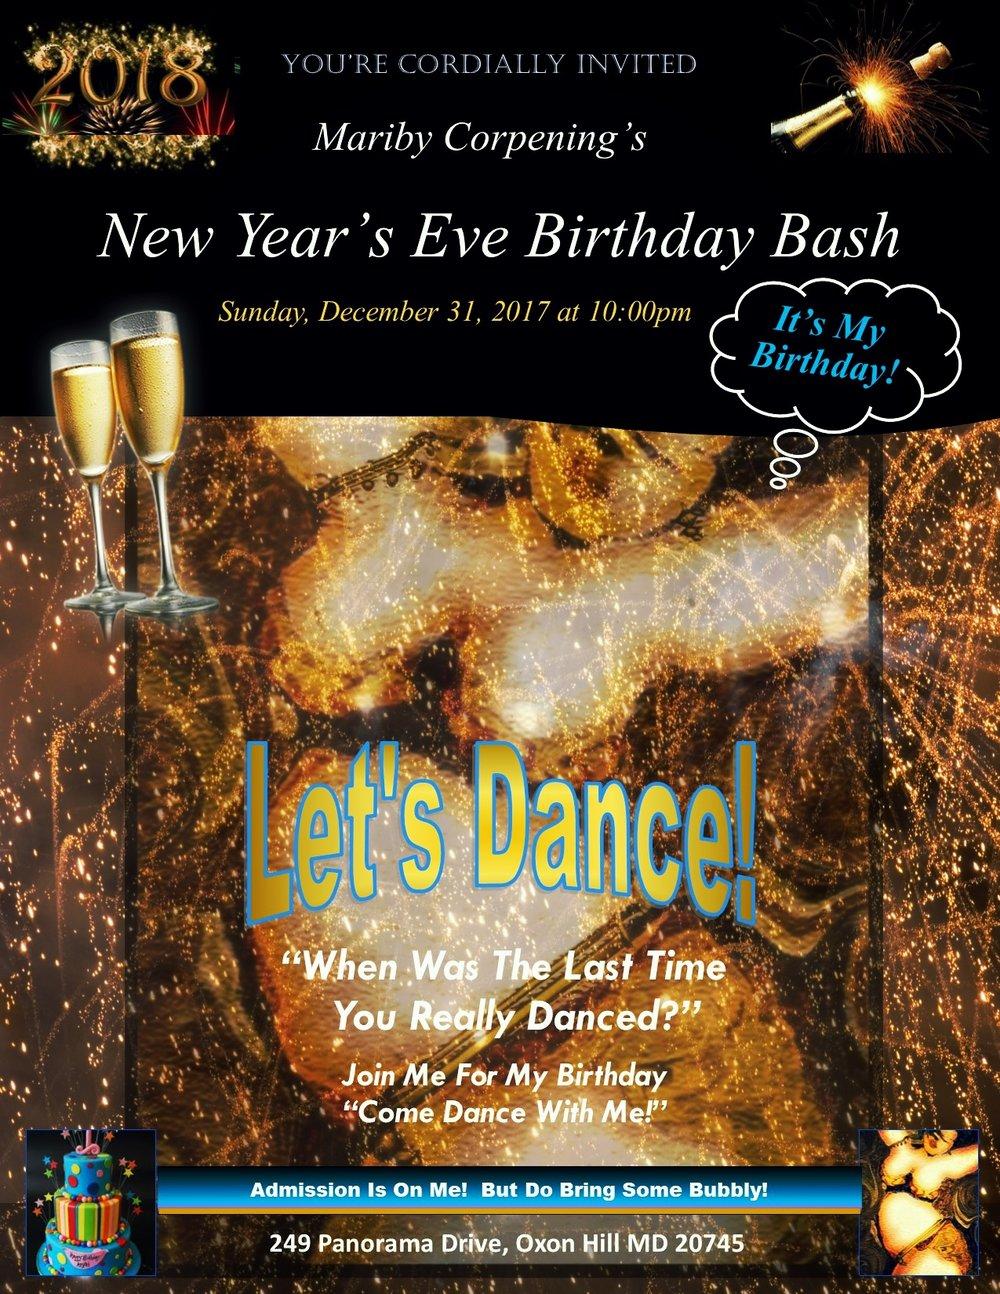 Flyer - Mariby Corpening's New Years Eve Birthday Bash2.jpg